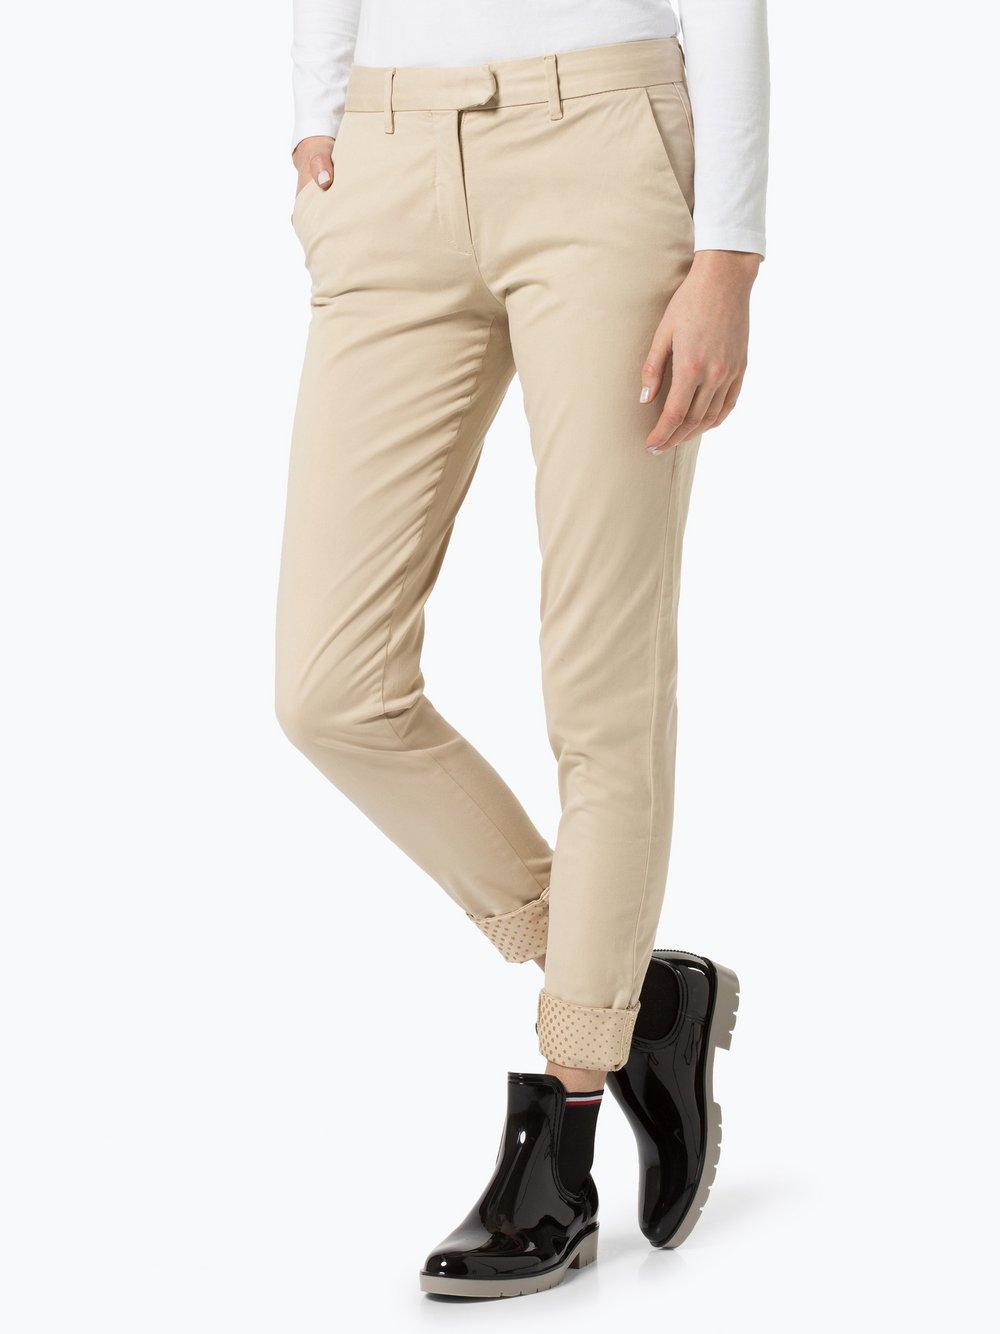 f7d256dff3d18 spodnie tommy hilfiger - spodnie damskie